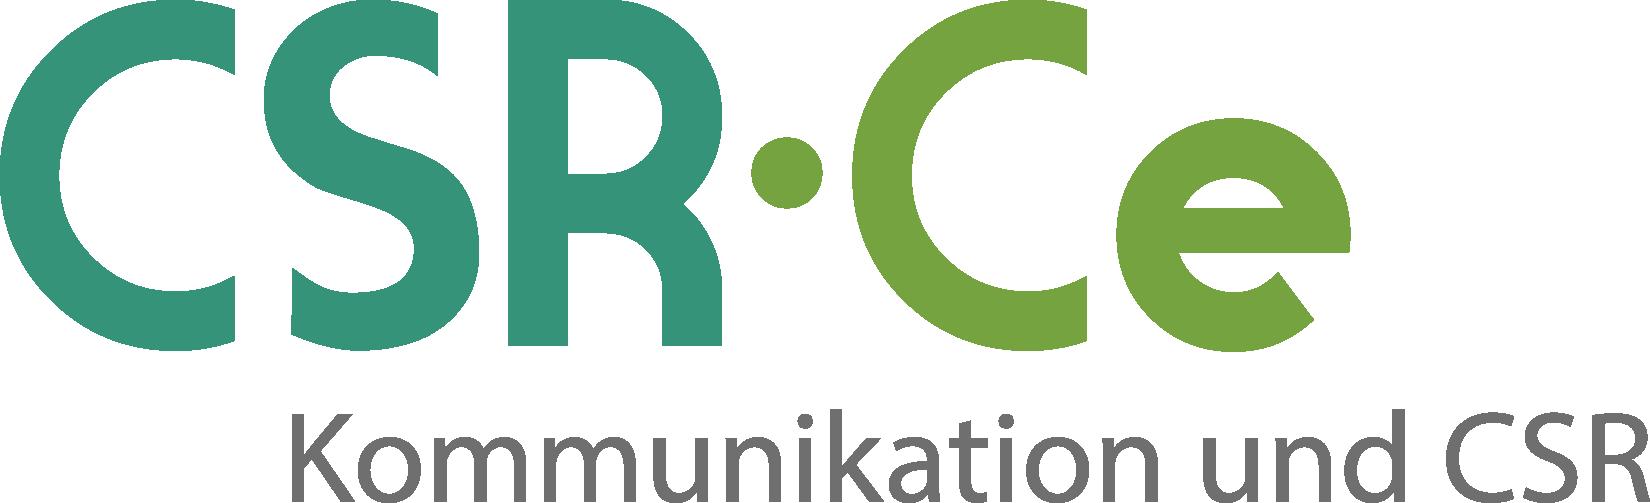 CSR-Ce